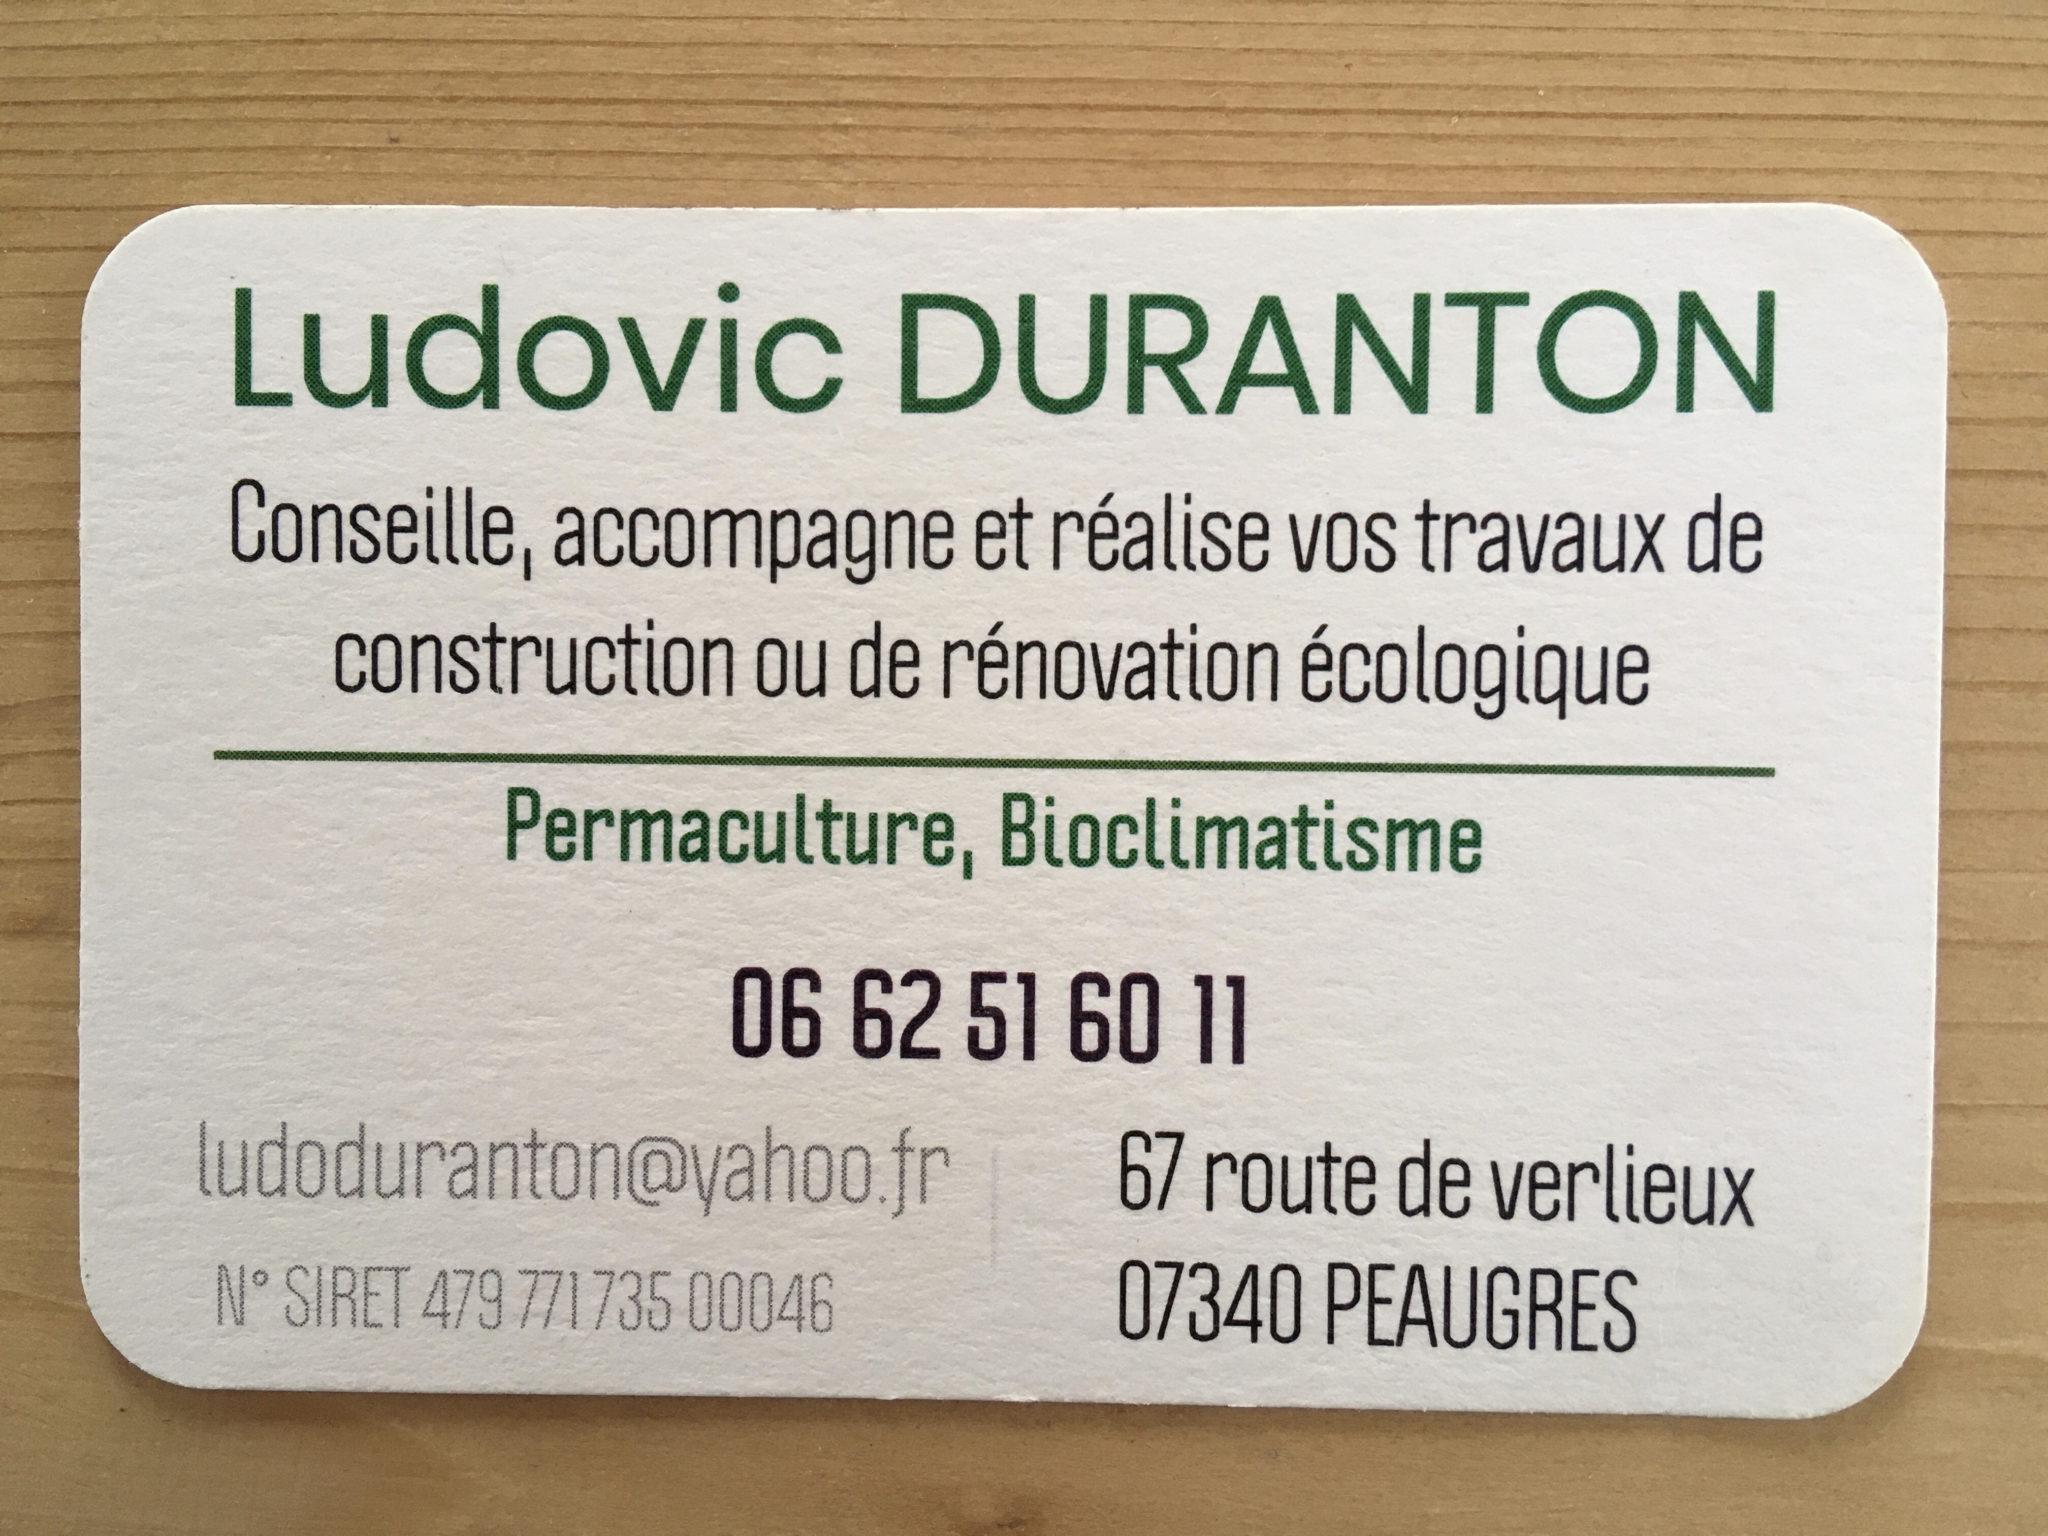 ludovic-duranton-logo1